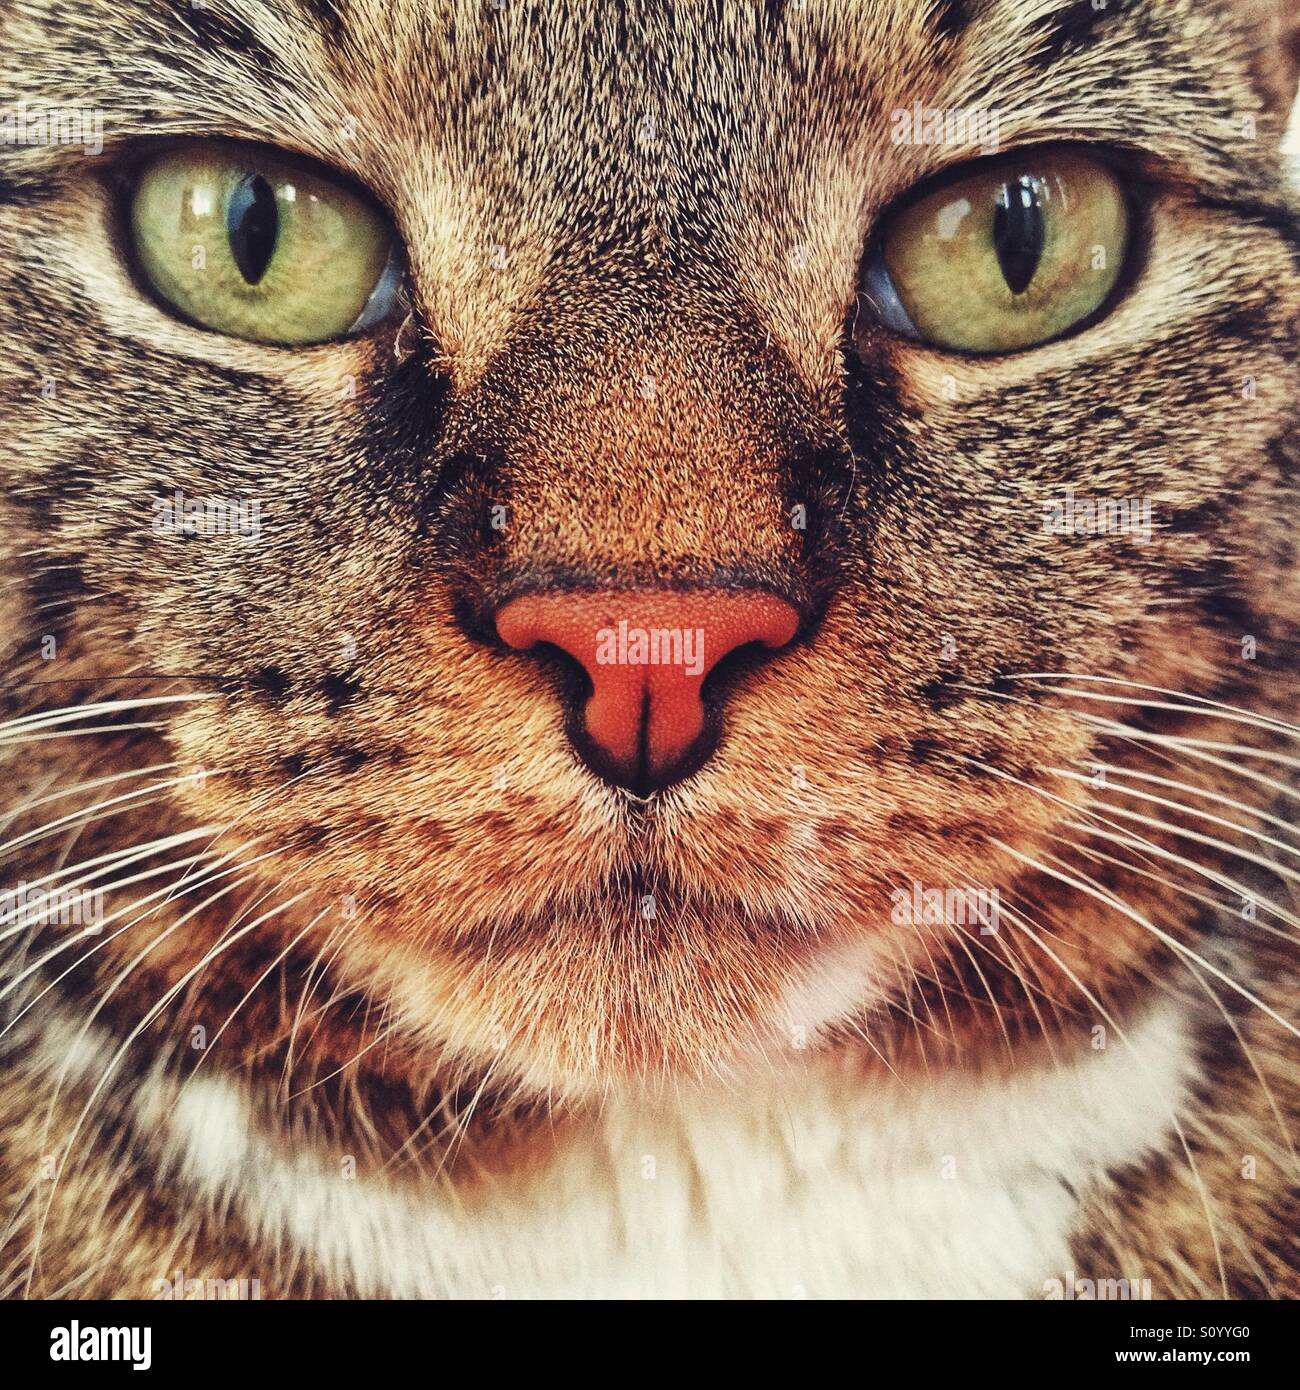 Pet tabby cat portrait. - Stock Image